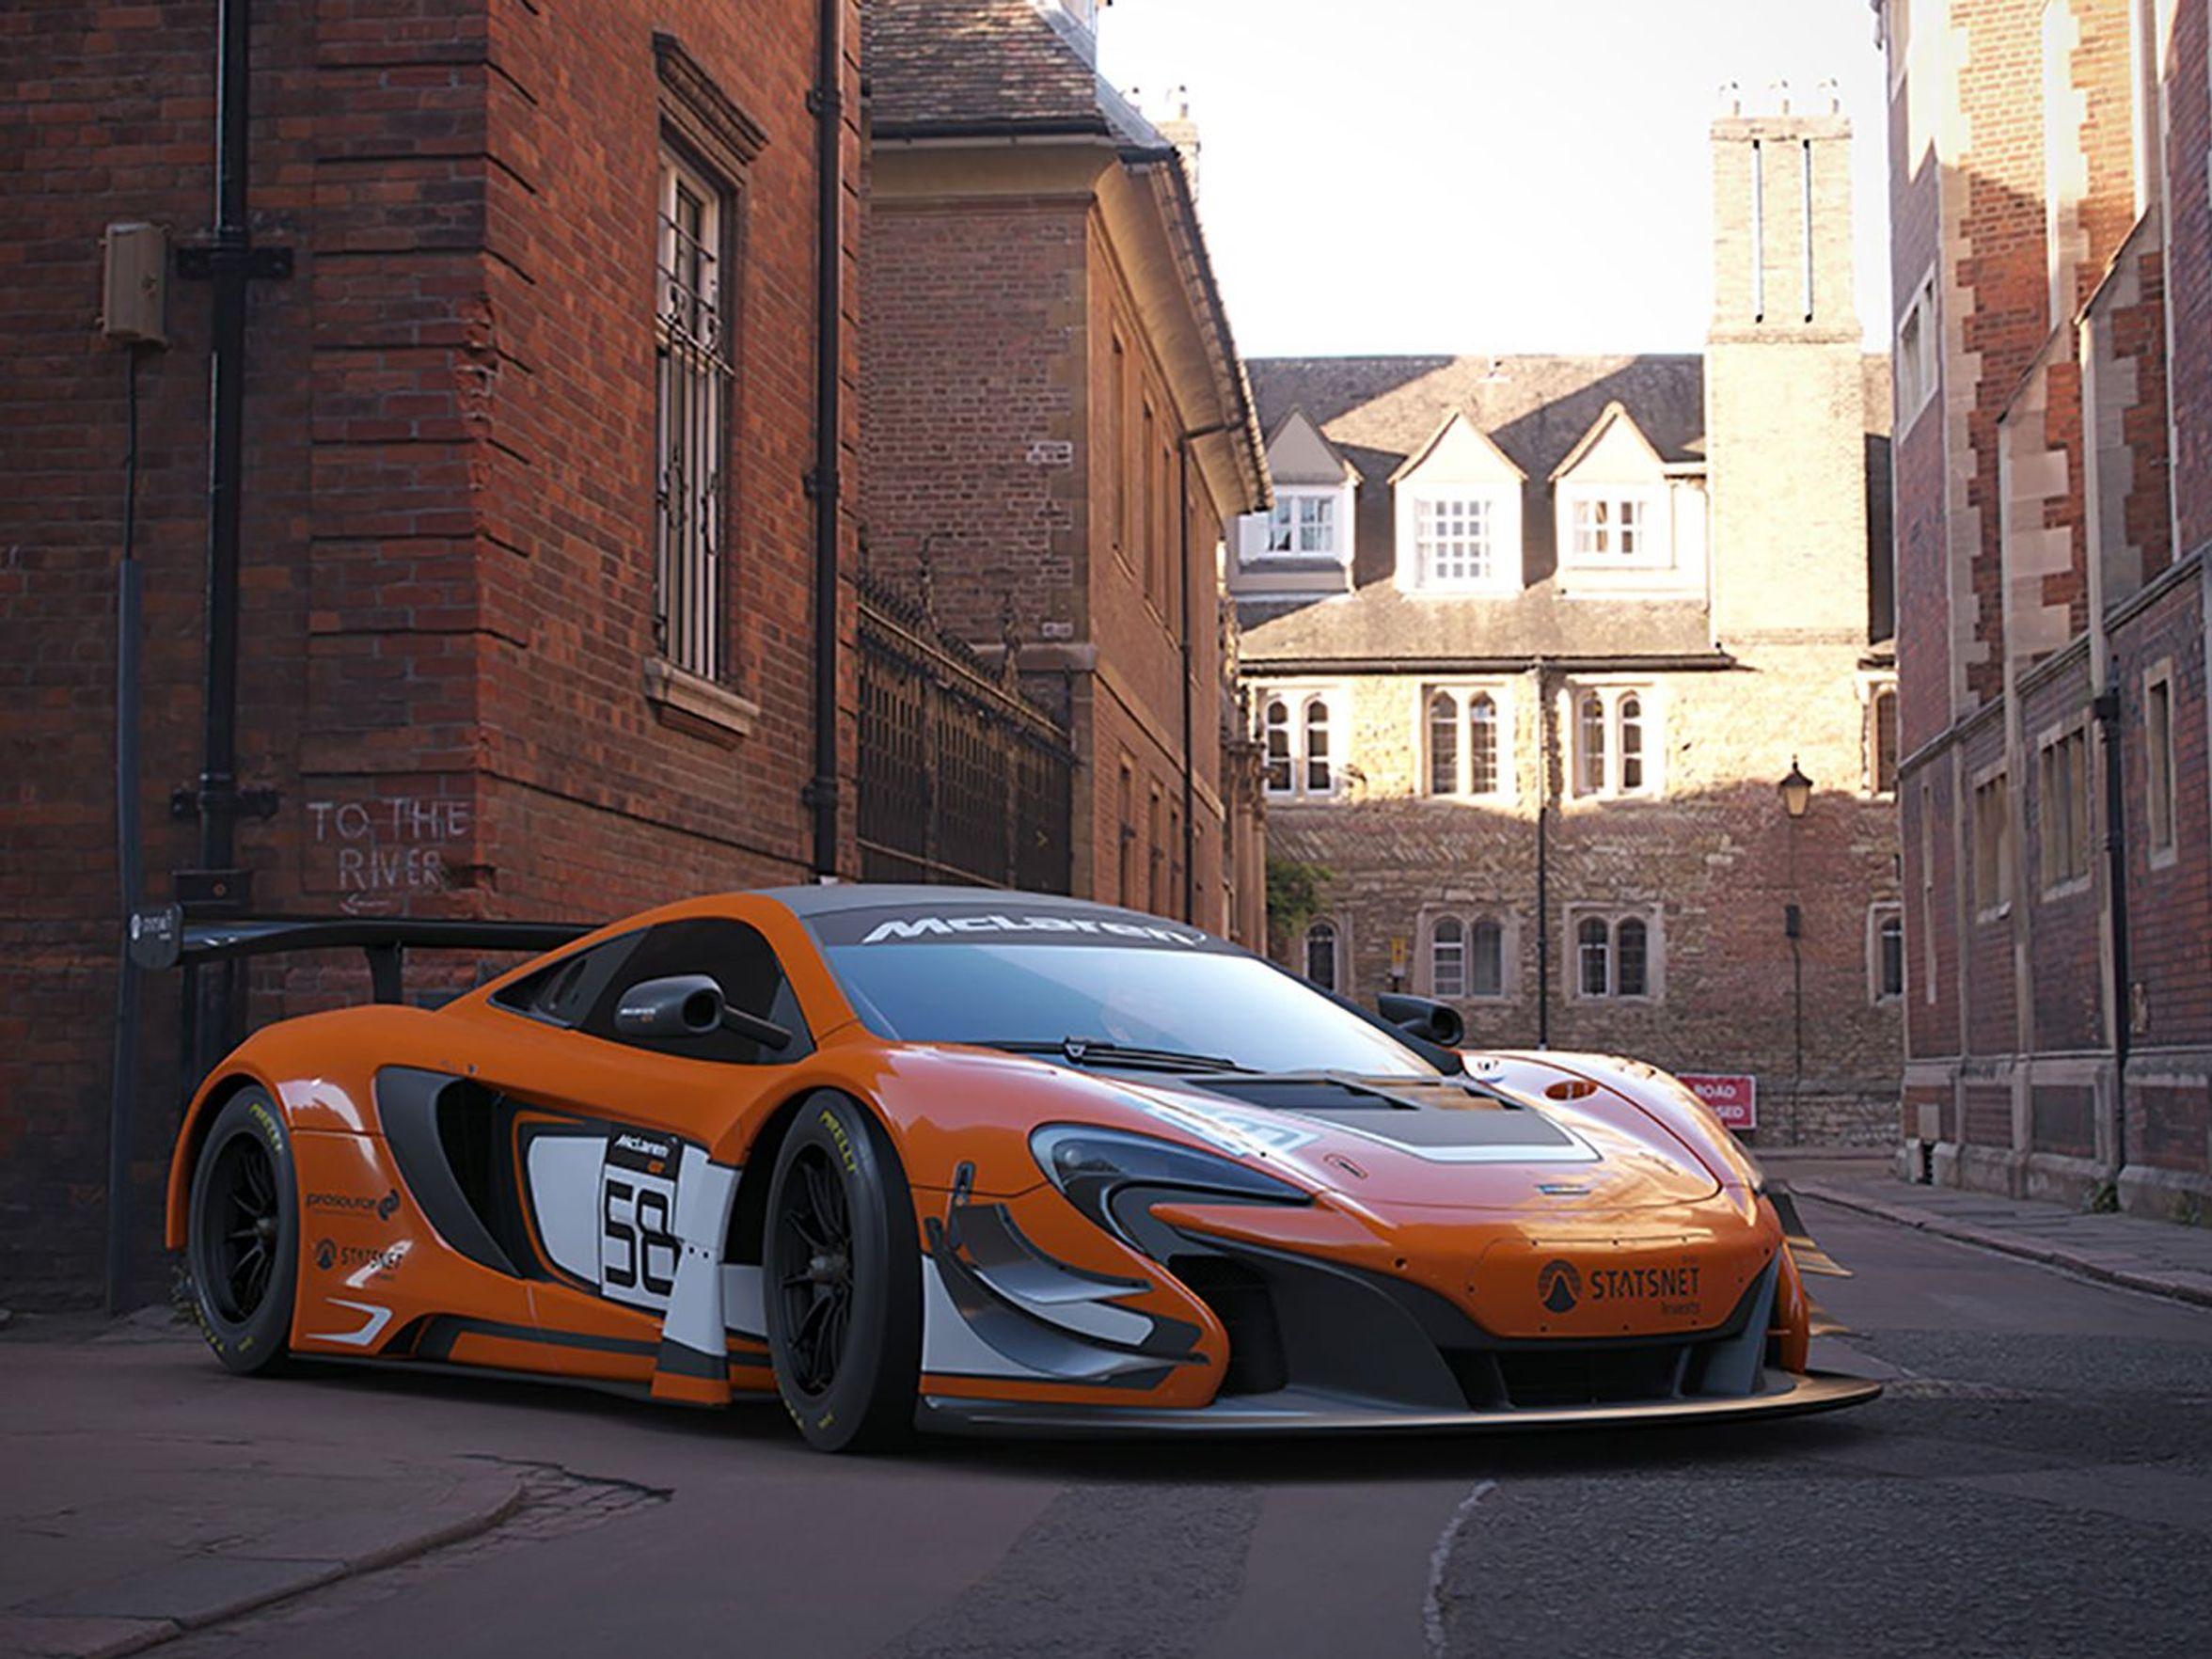 Gran Turismo offers near-photorealistic visuals